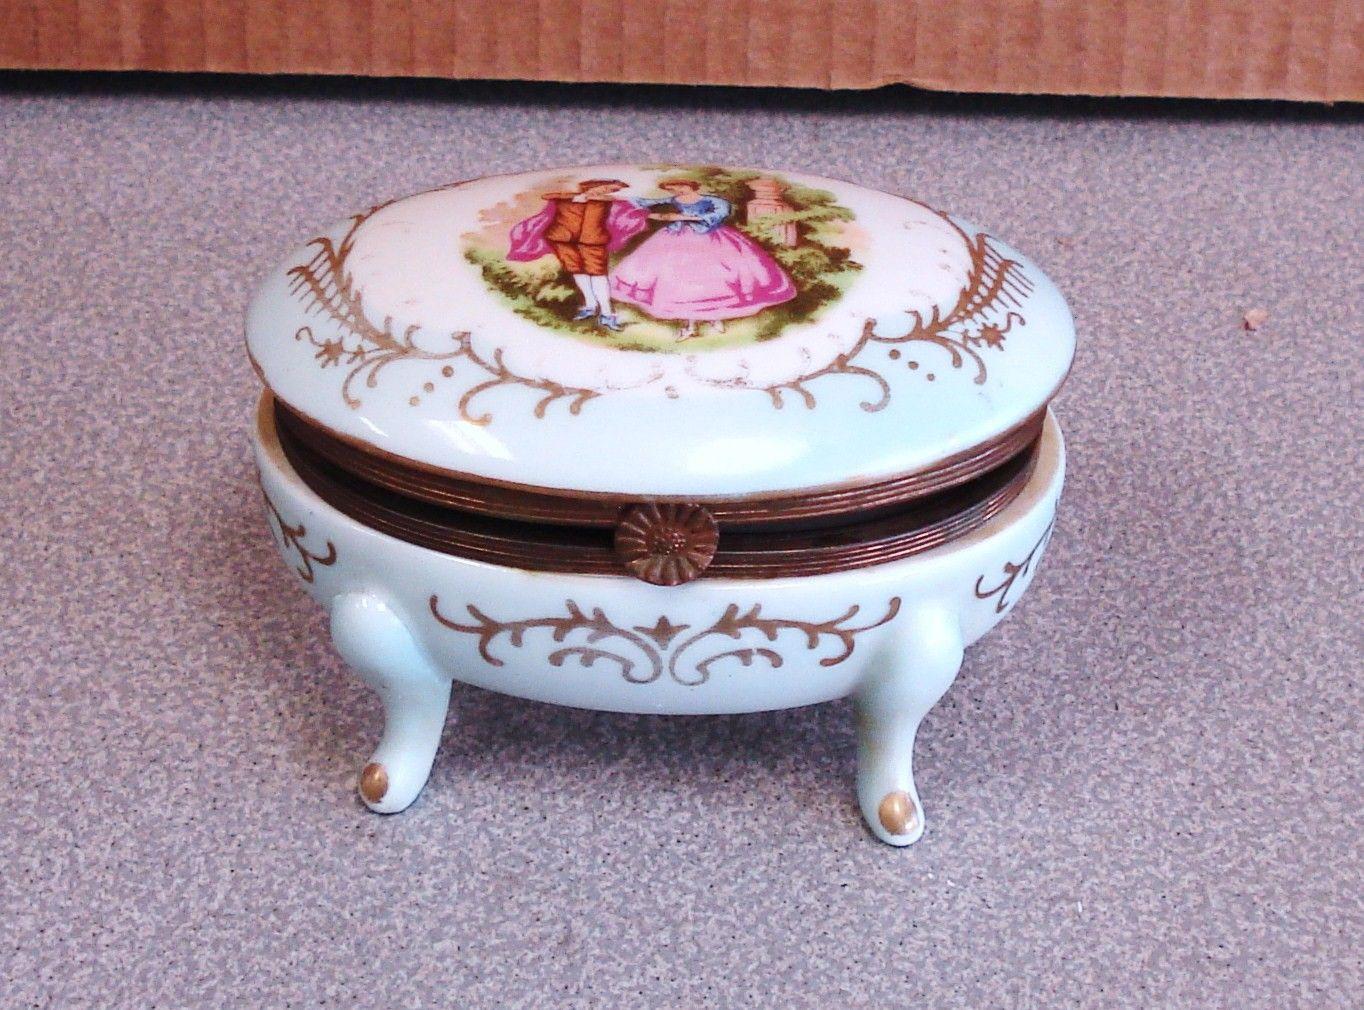 Vintage Porcelain Jewelery Trinket Box. $32.00, via Etsy.